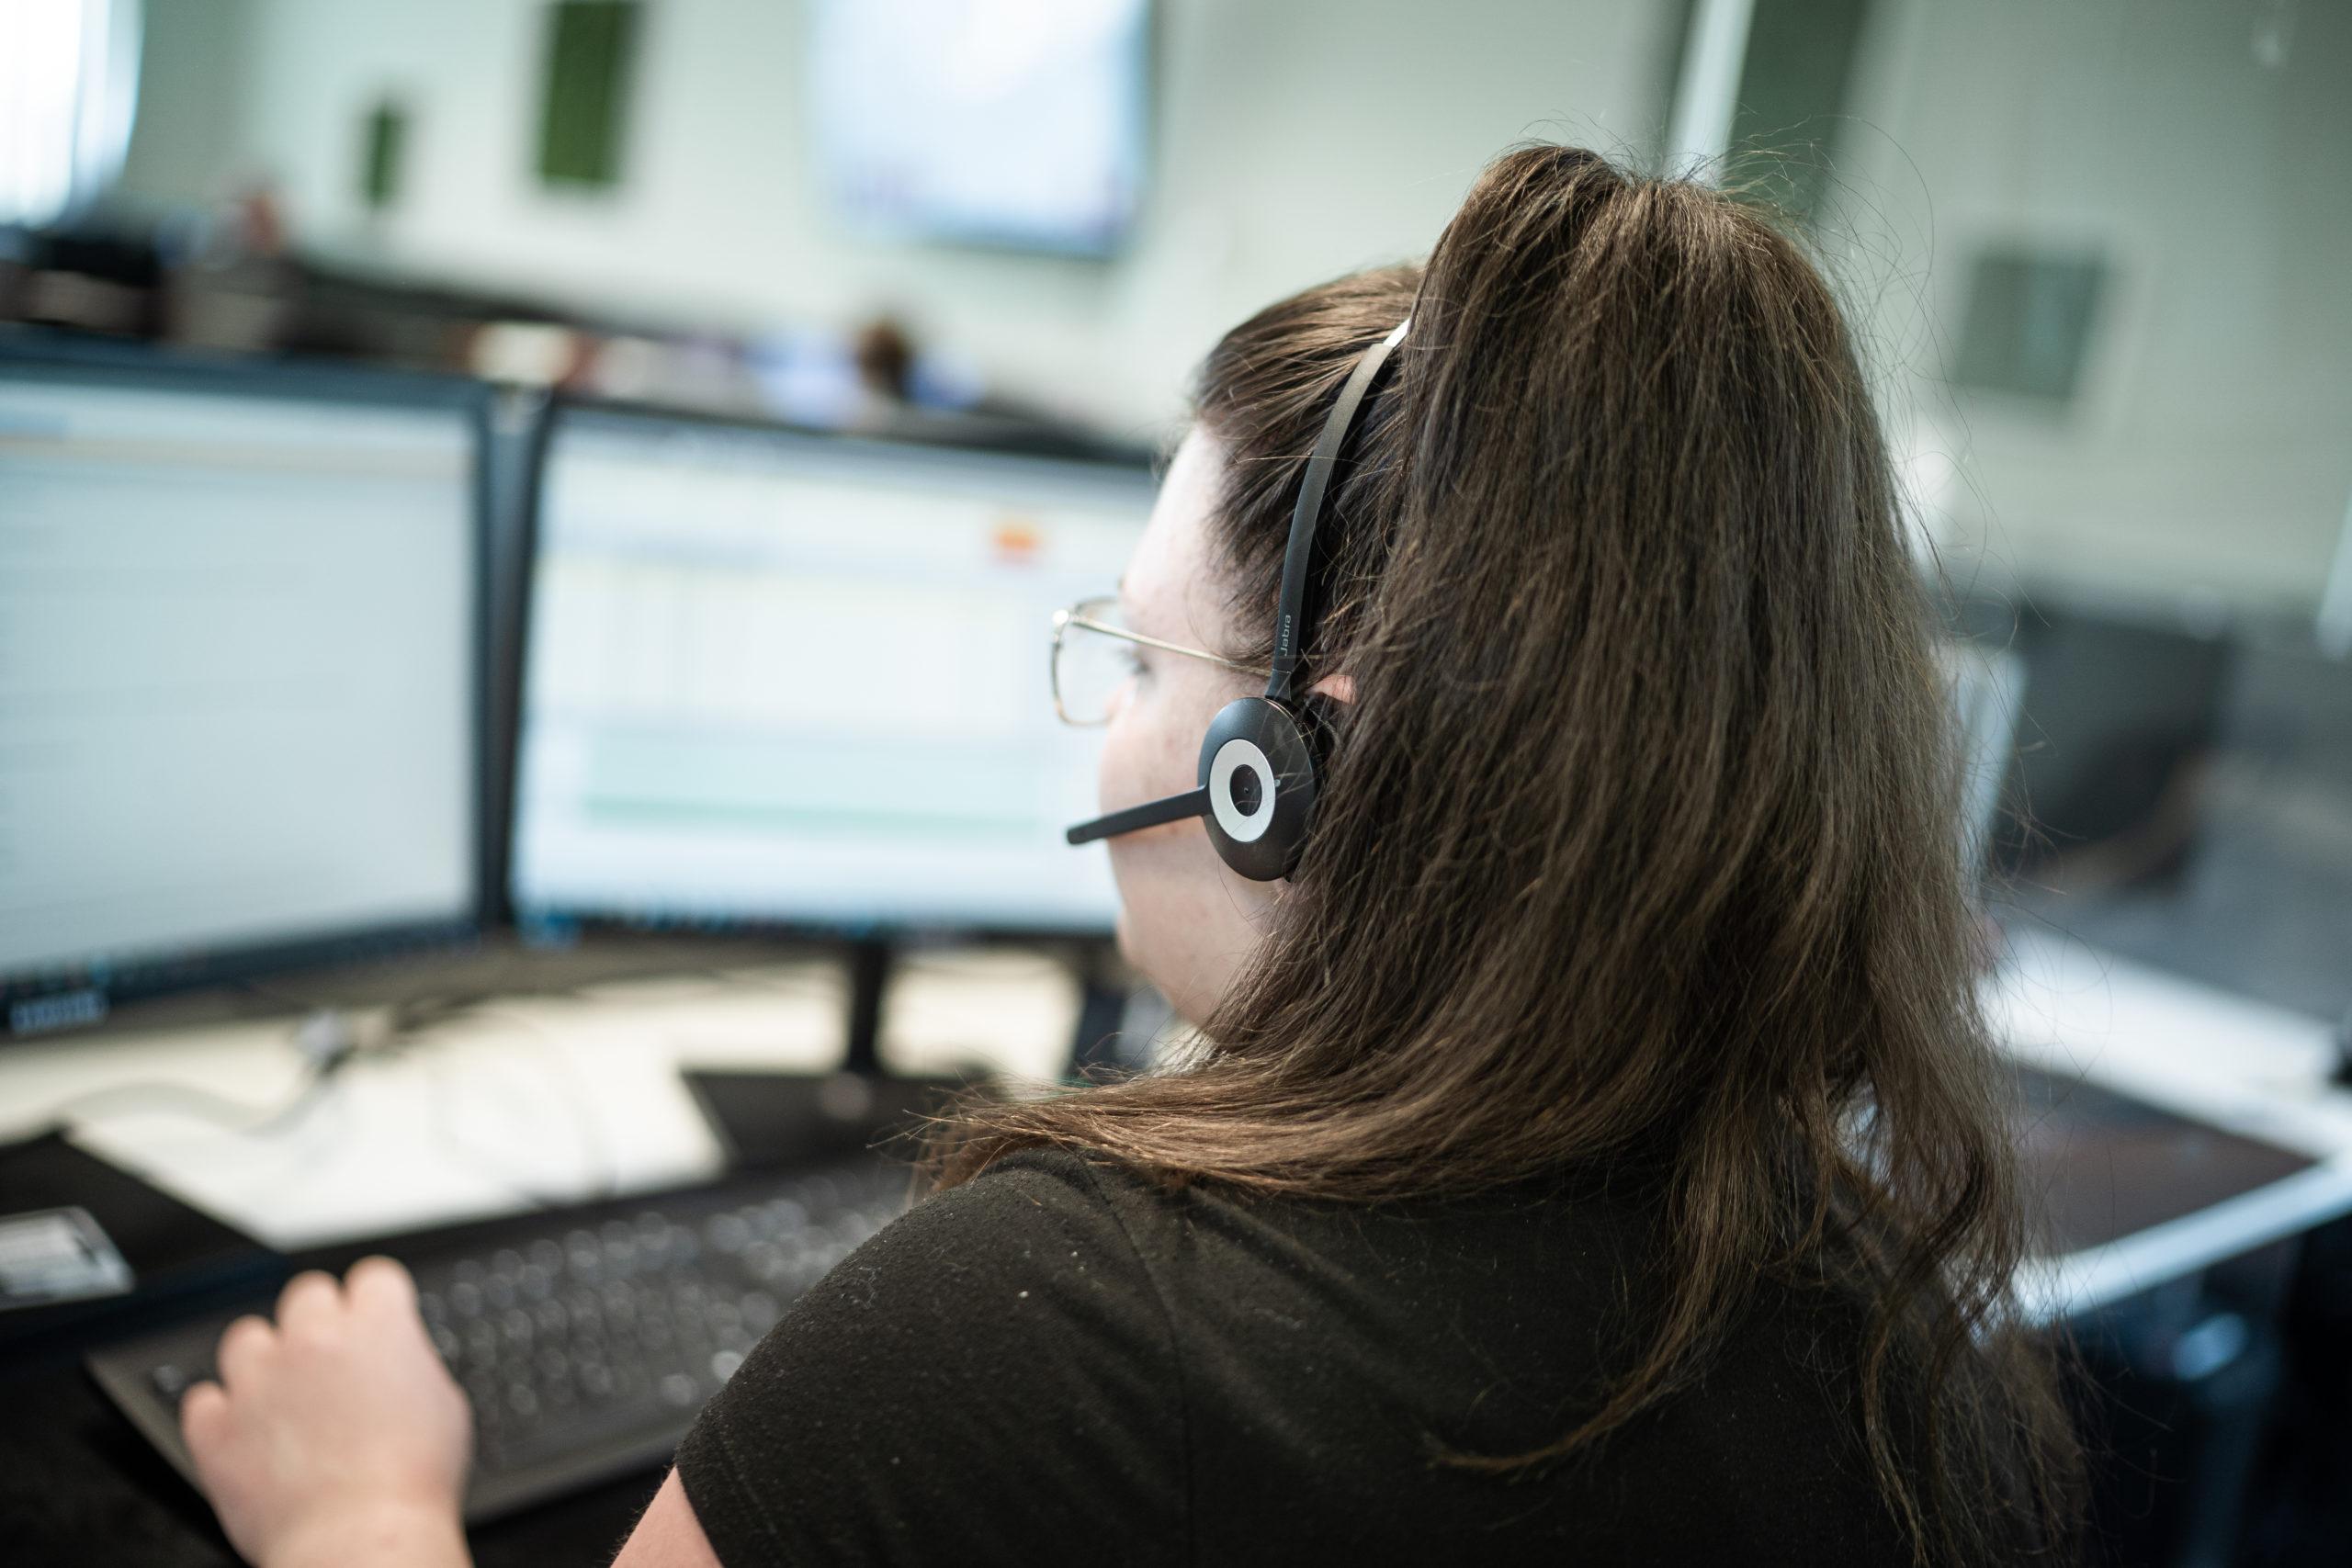 Telefonsupport, Telefon Call Center Support bei Trendcom